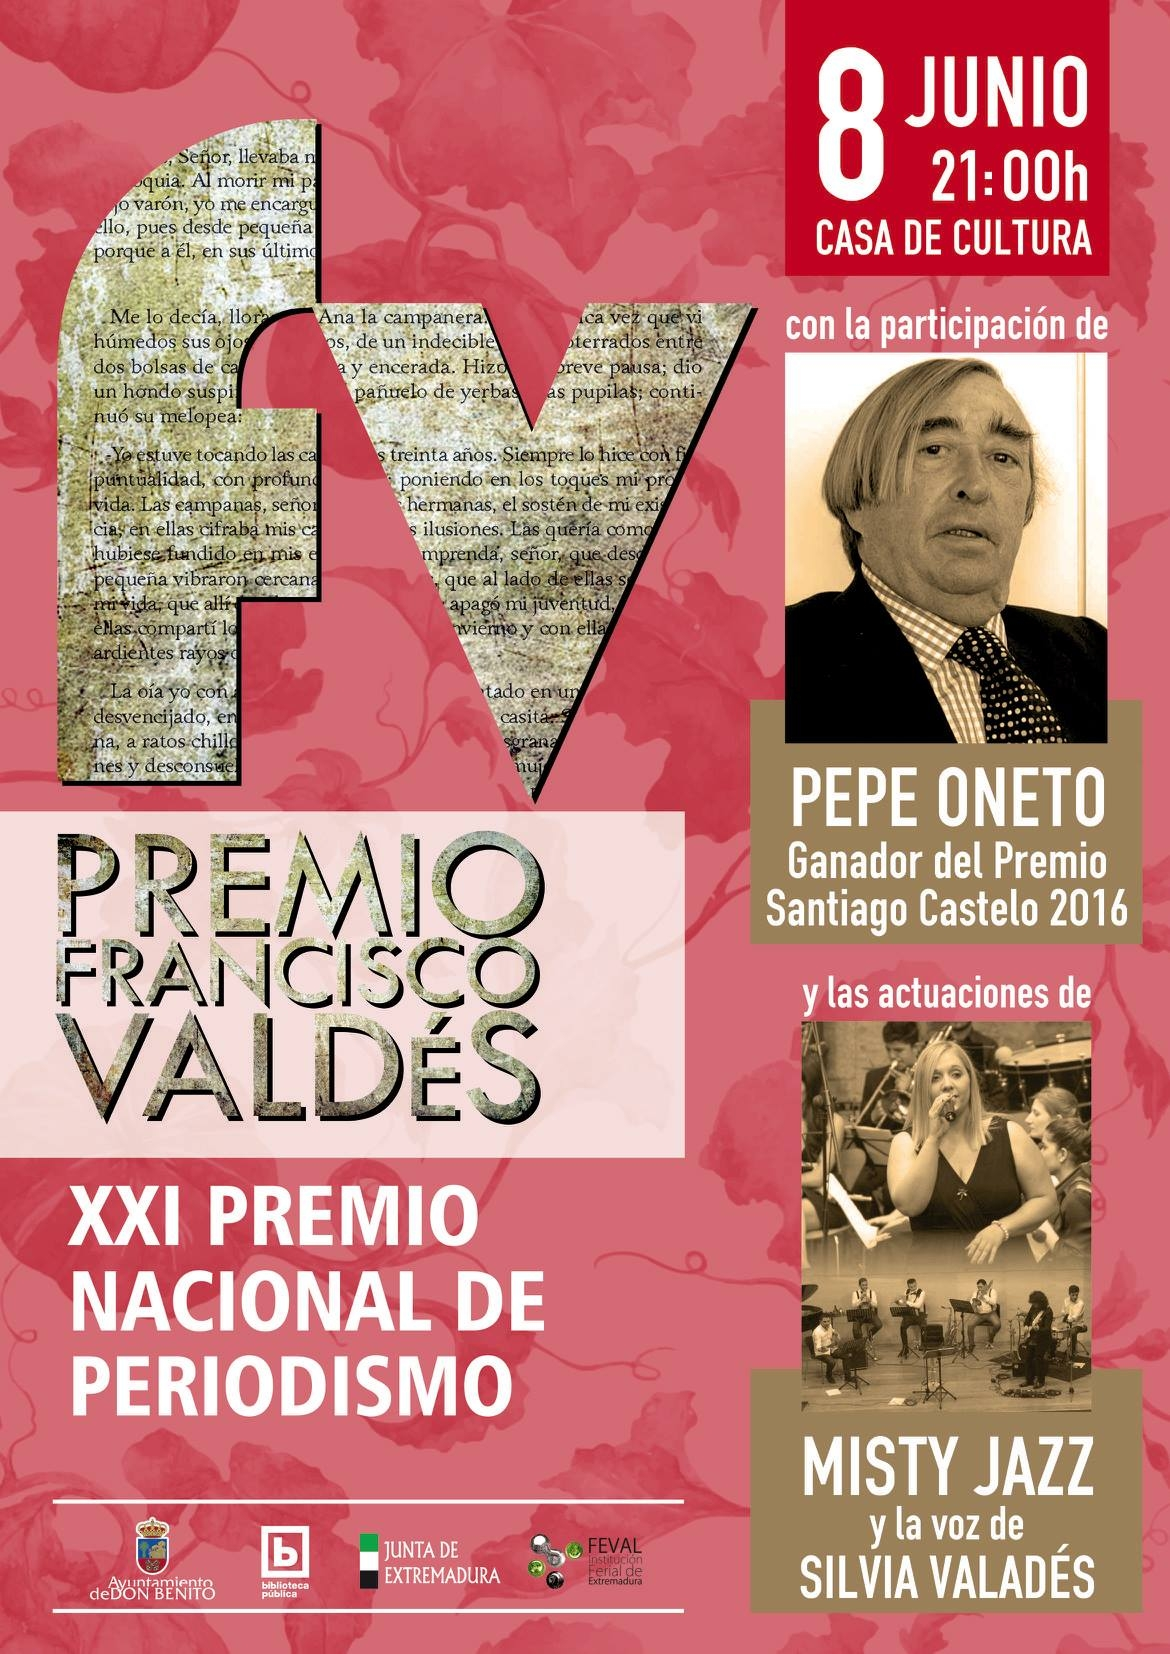 Premio Francisco Valdes (XXI Premio Nacional de Periodismo)